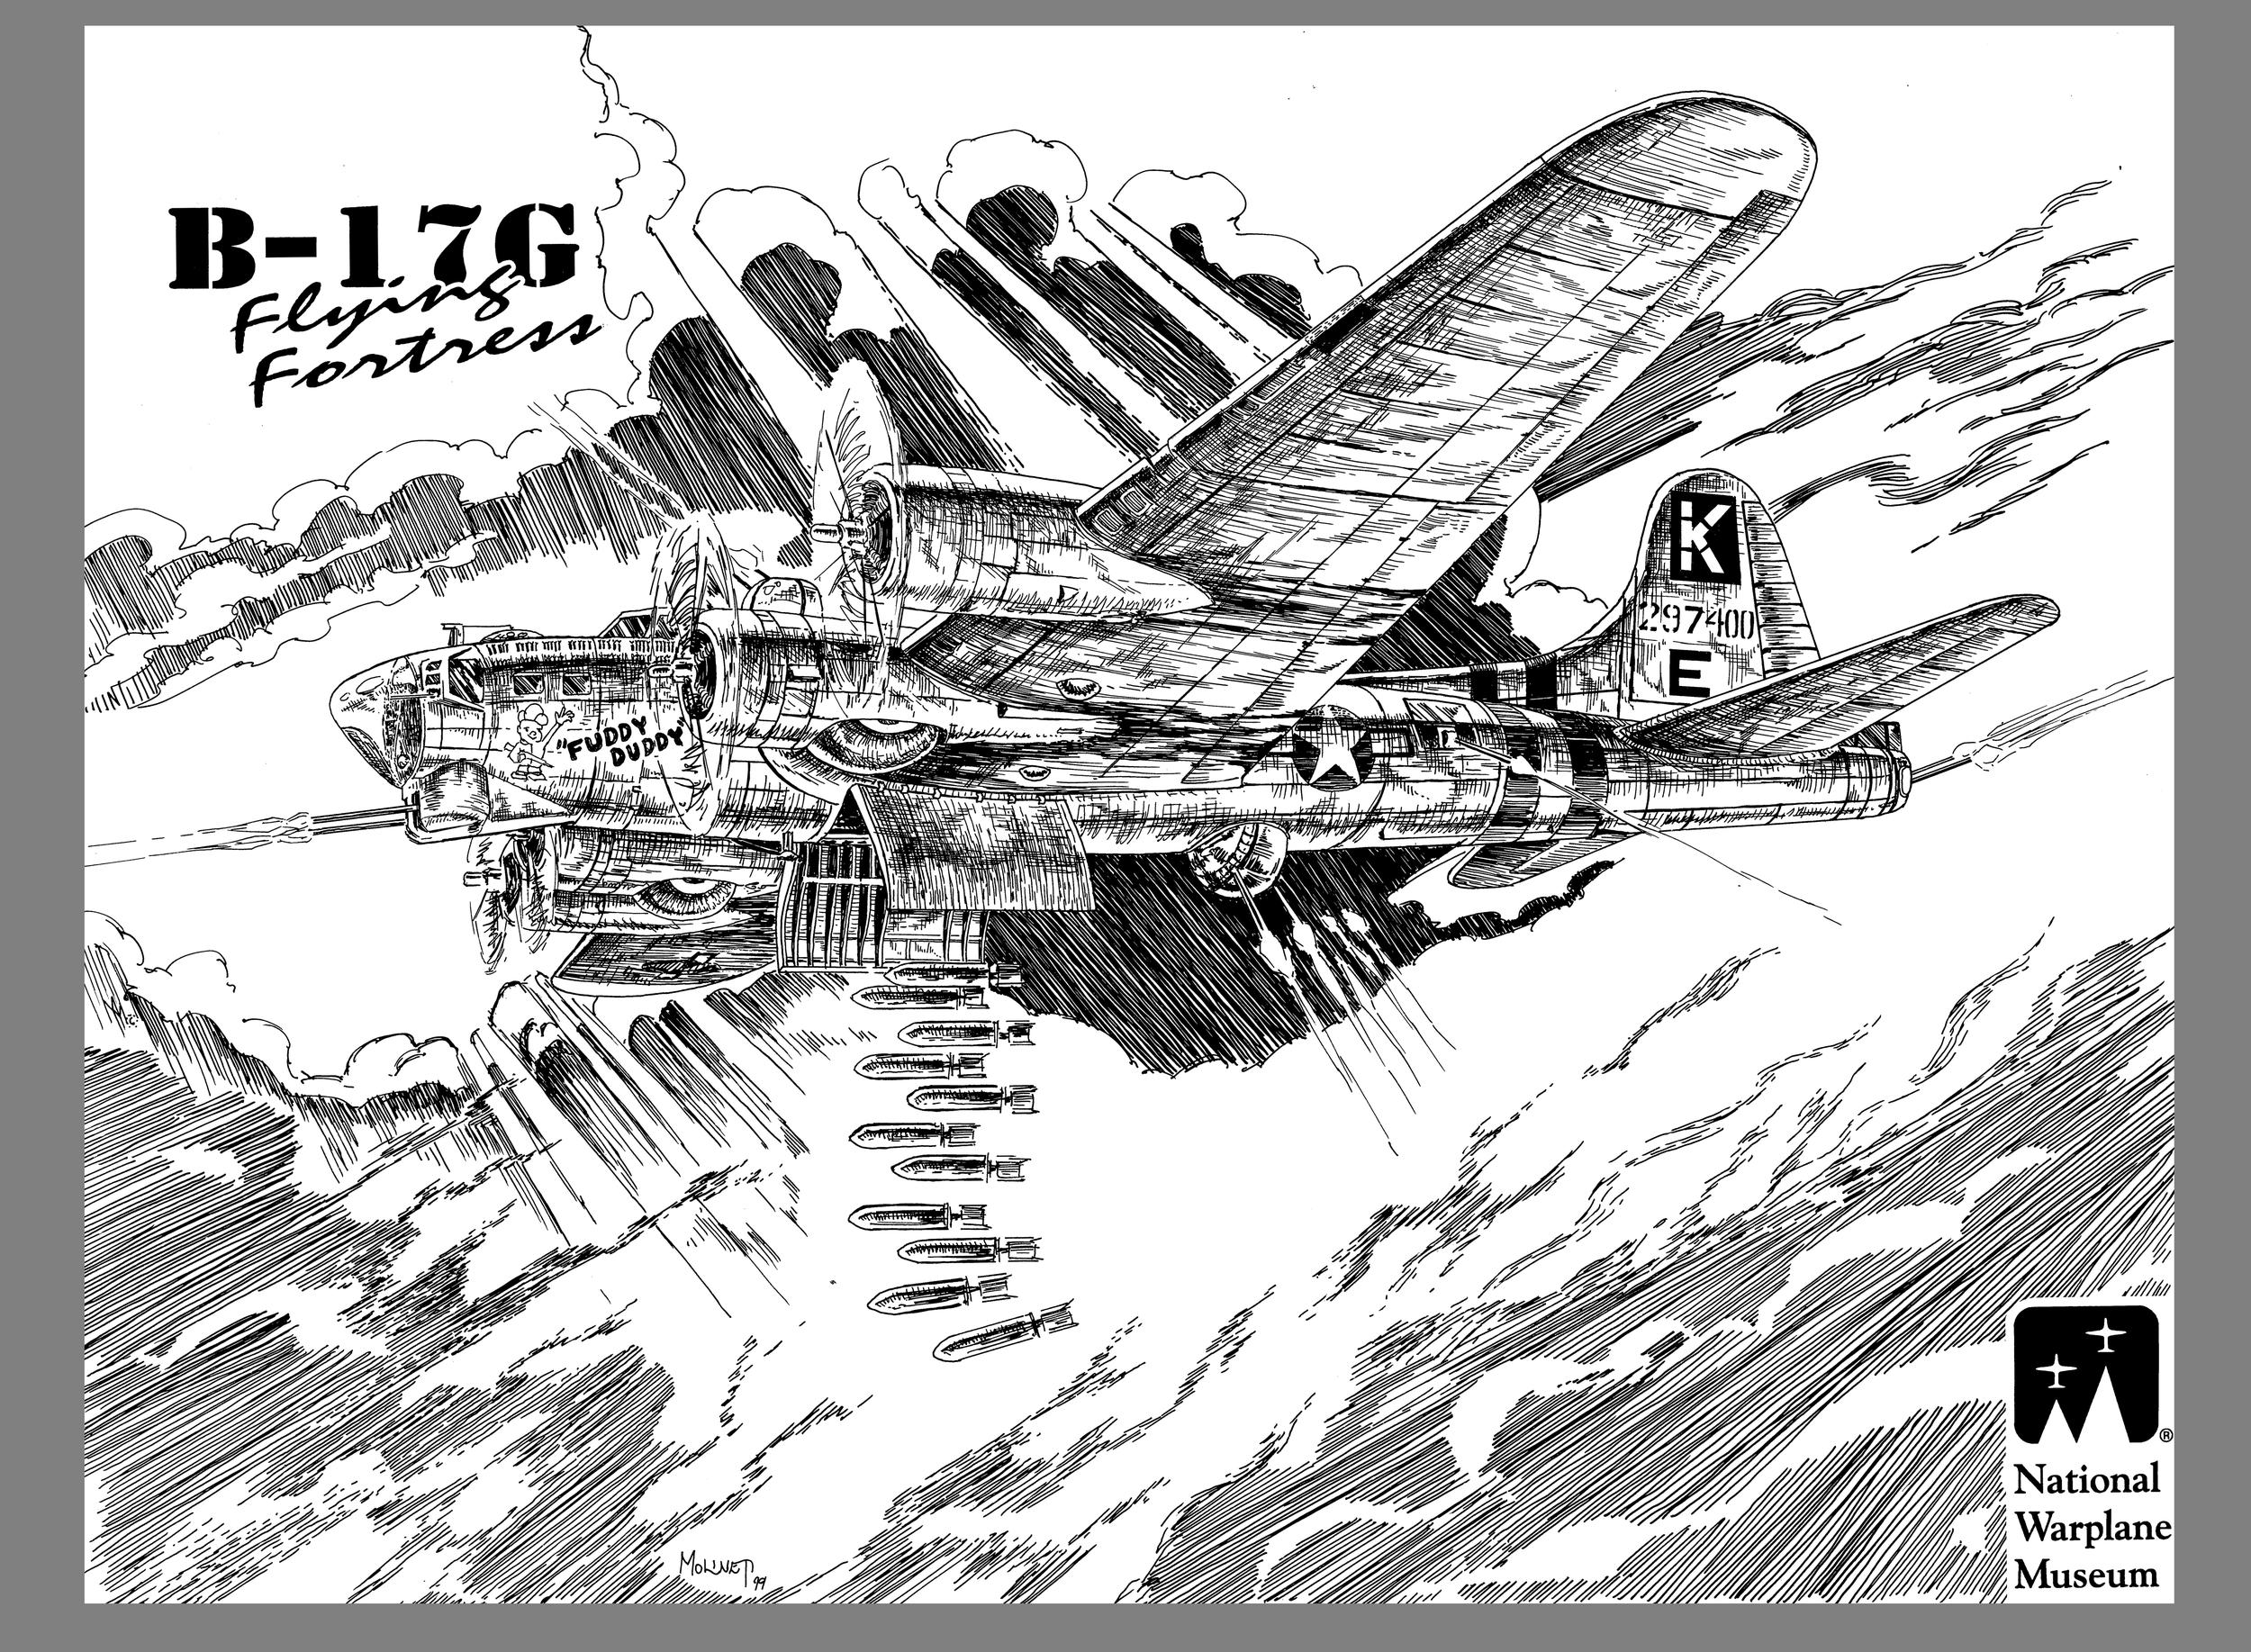 b-17g.png